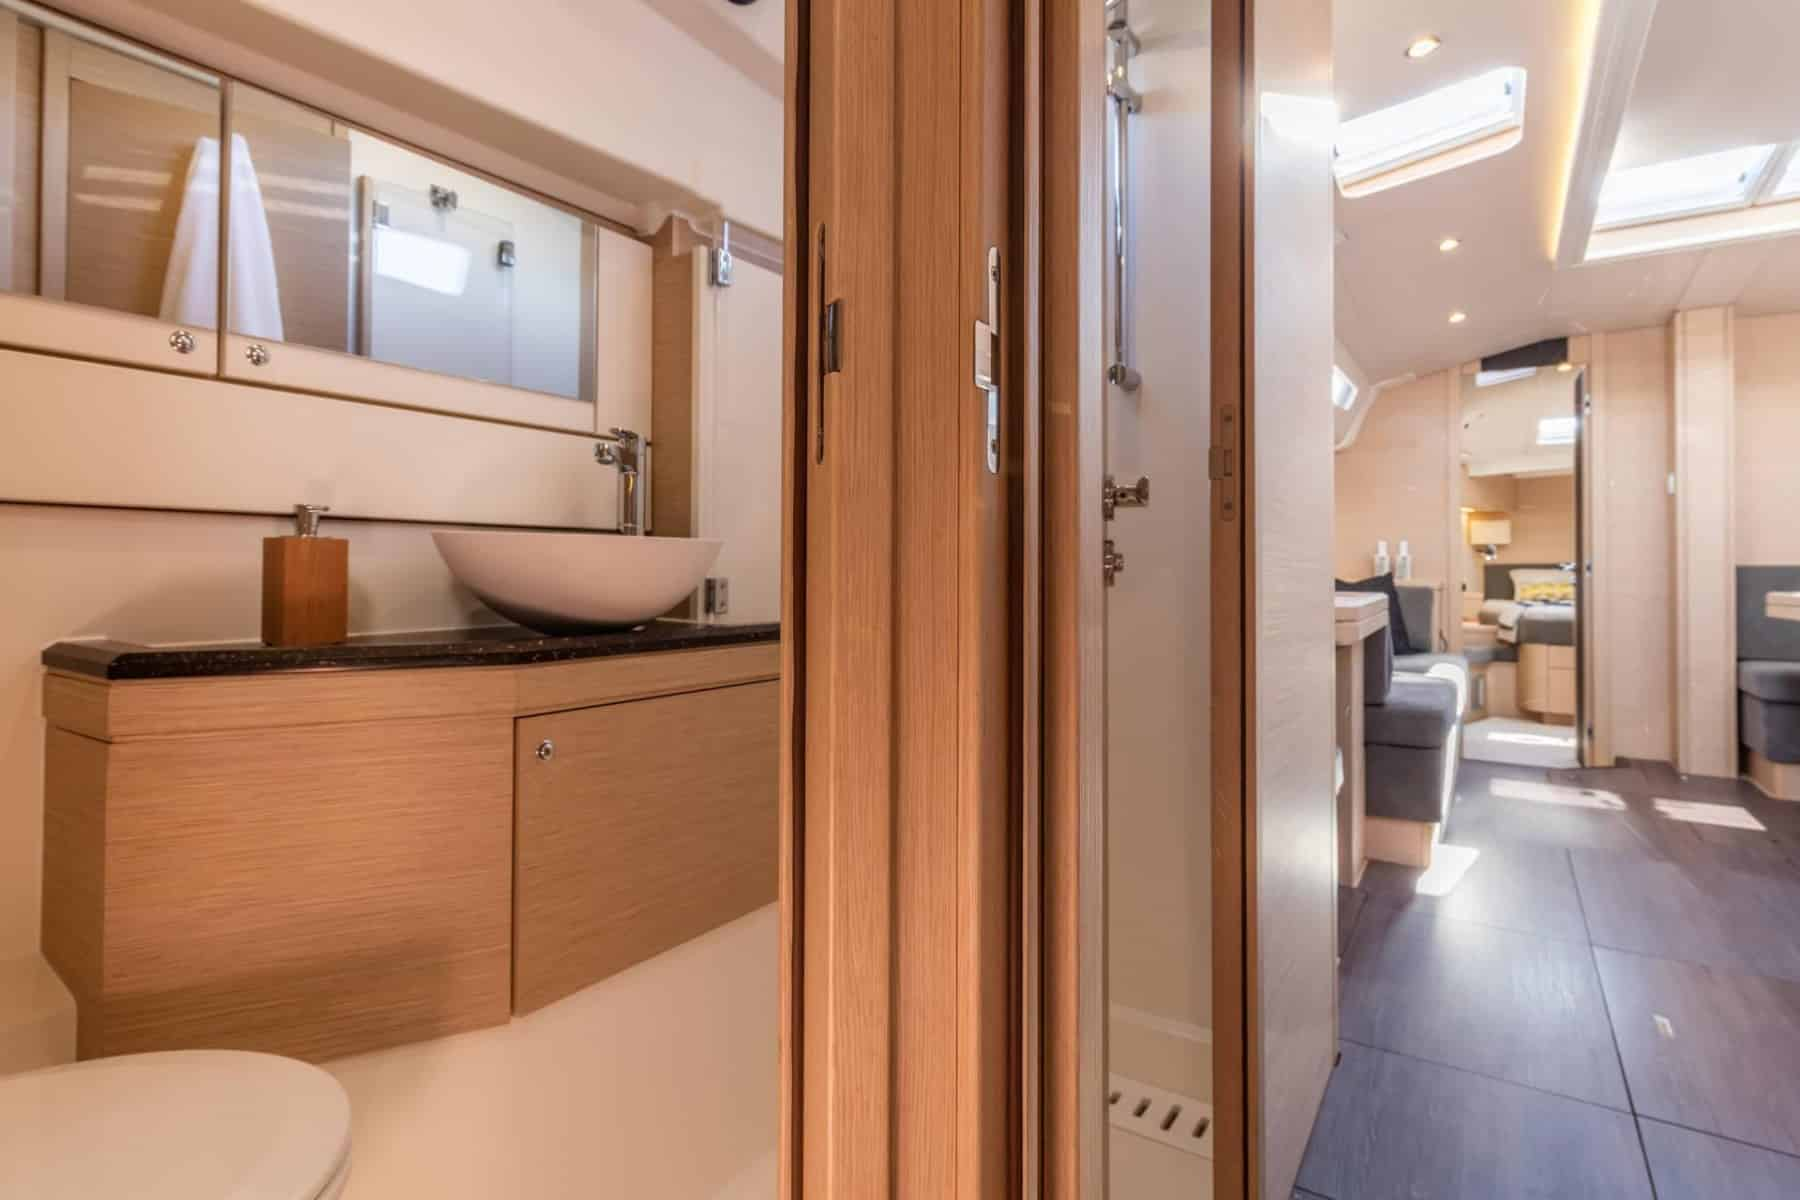 Jeanneau-51-interior-head-2-charter-ownership-yacht